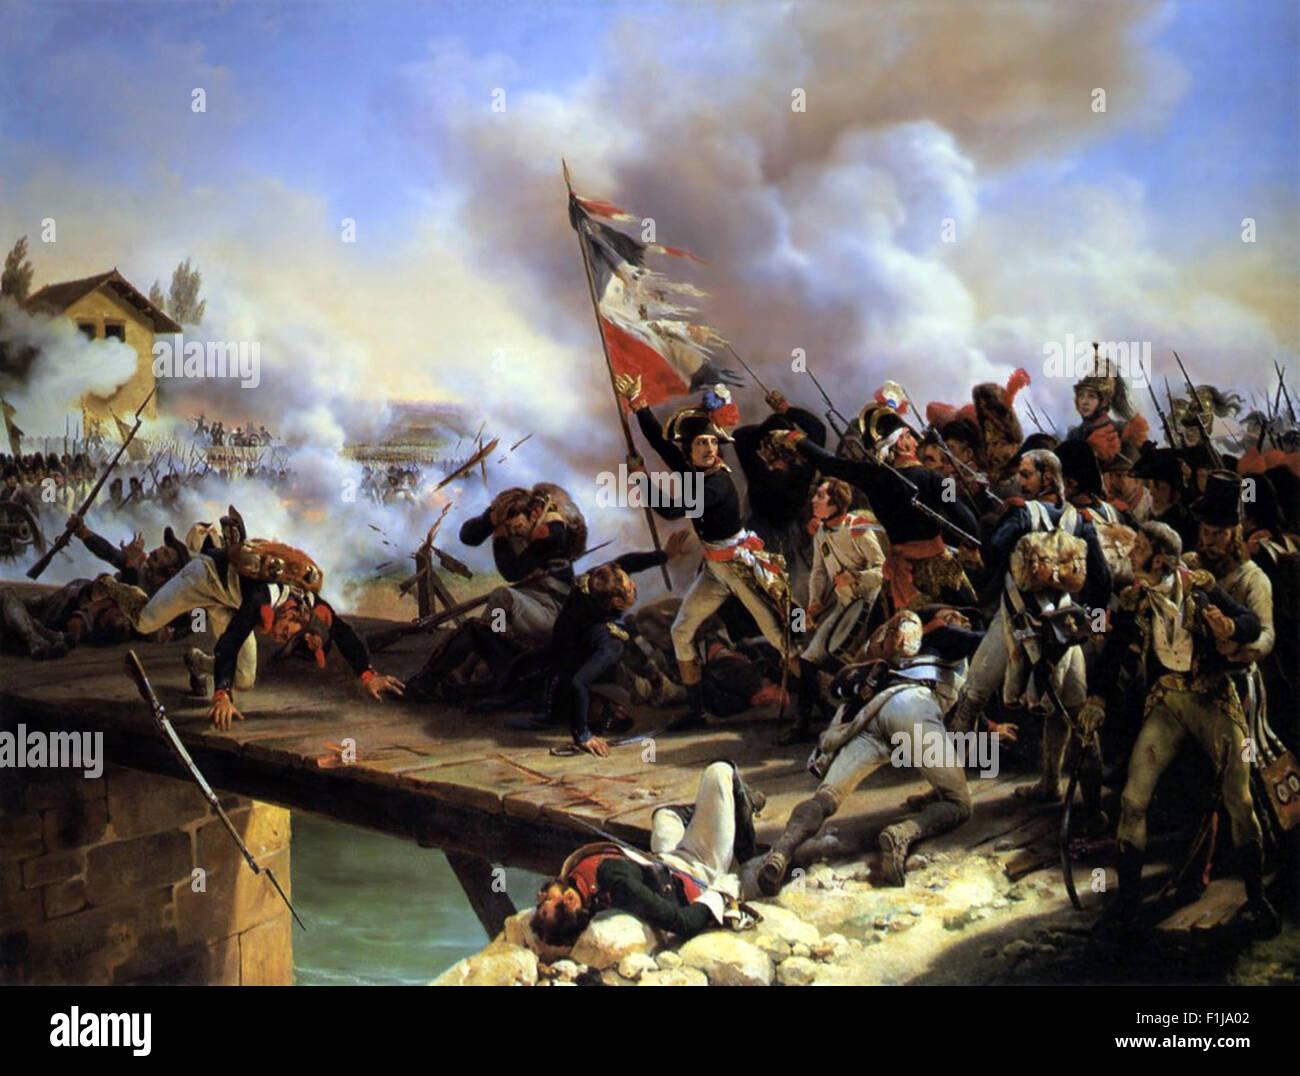 Napoleon Bonaparte leading his troops over the bridge of Arcole, by Horace Vernet in 1826. Napoléon Bonaparte, - Stock Image